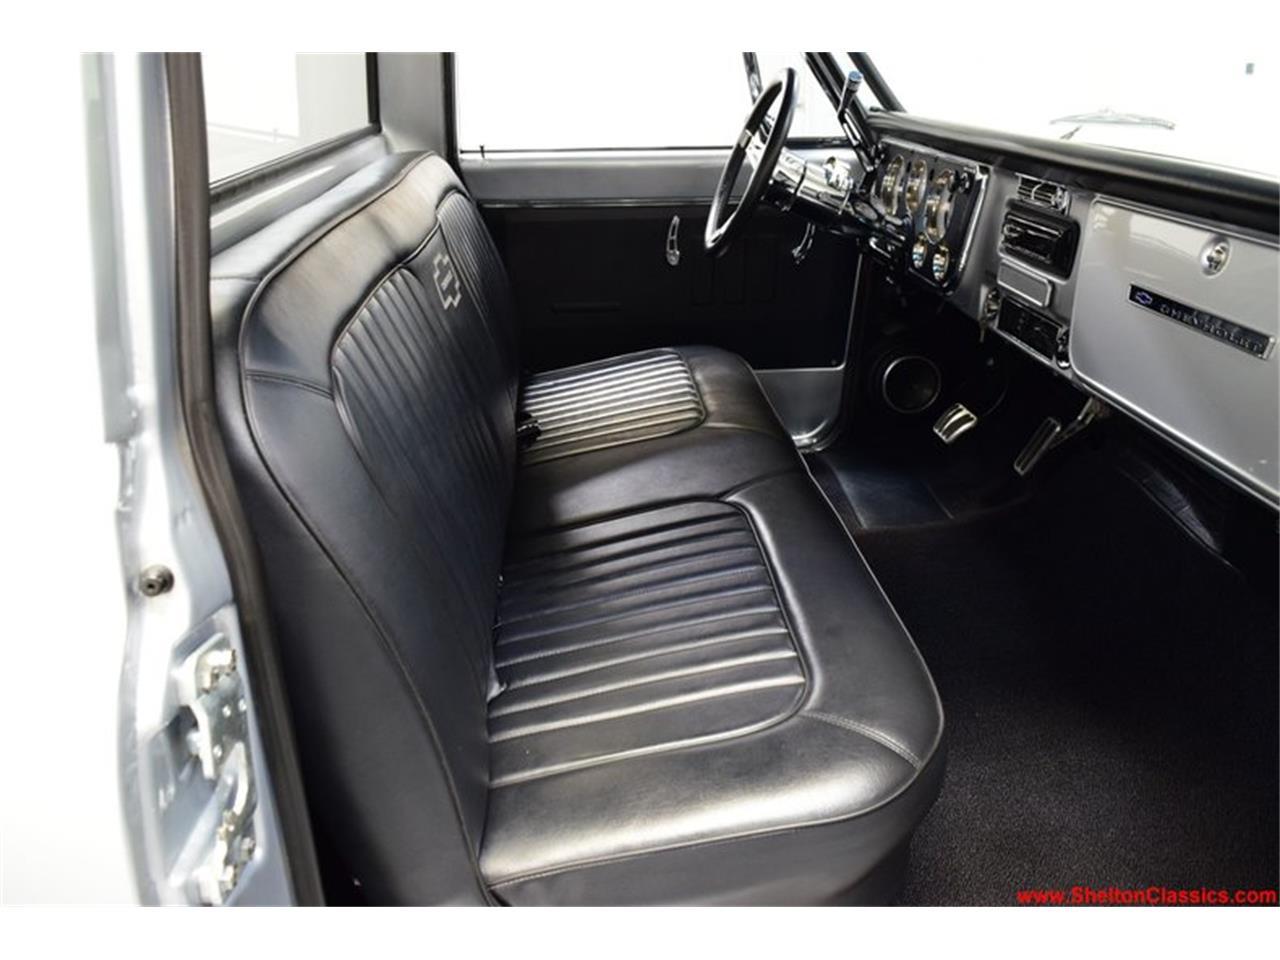 Large Picture of '71 C10 located in North Carolina - $59,995.00 - Q6DQ